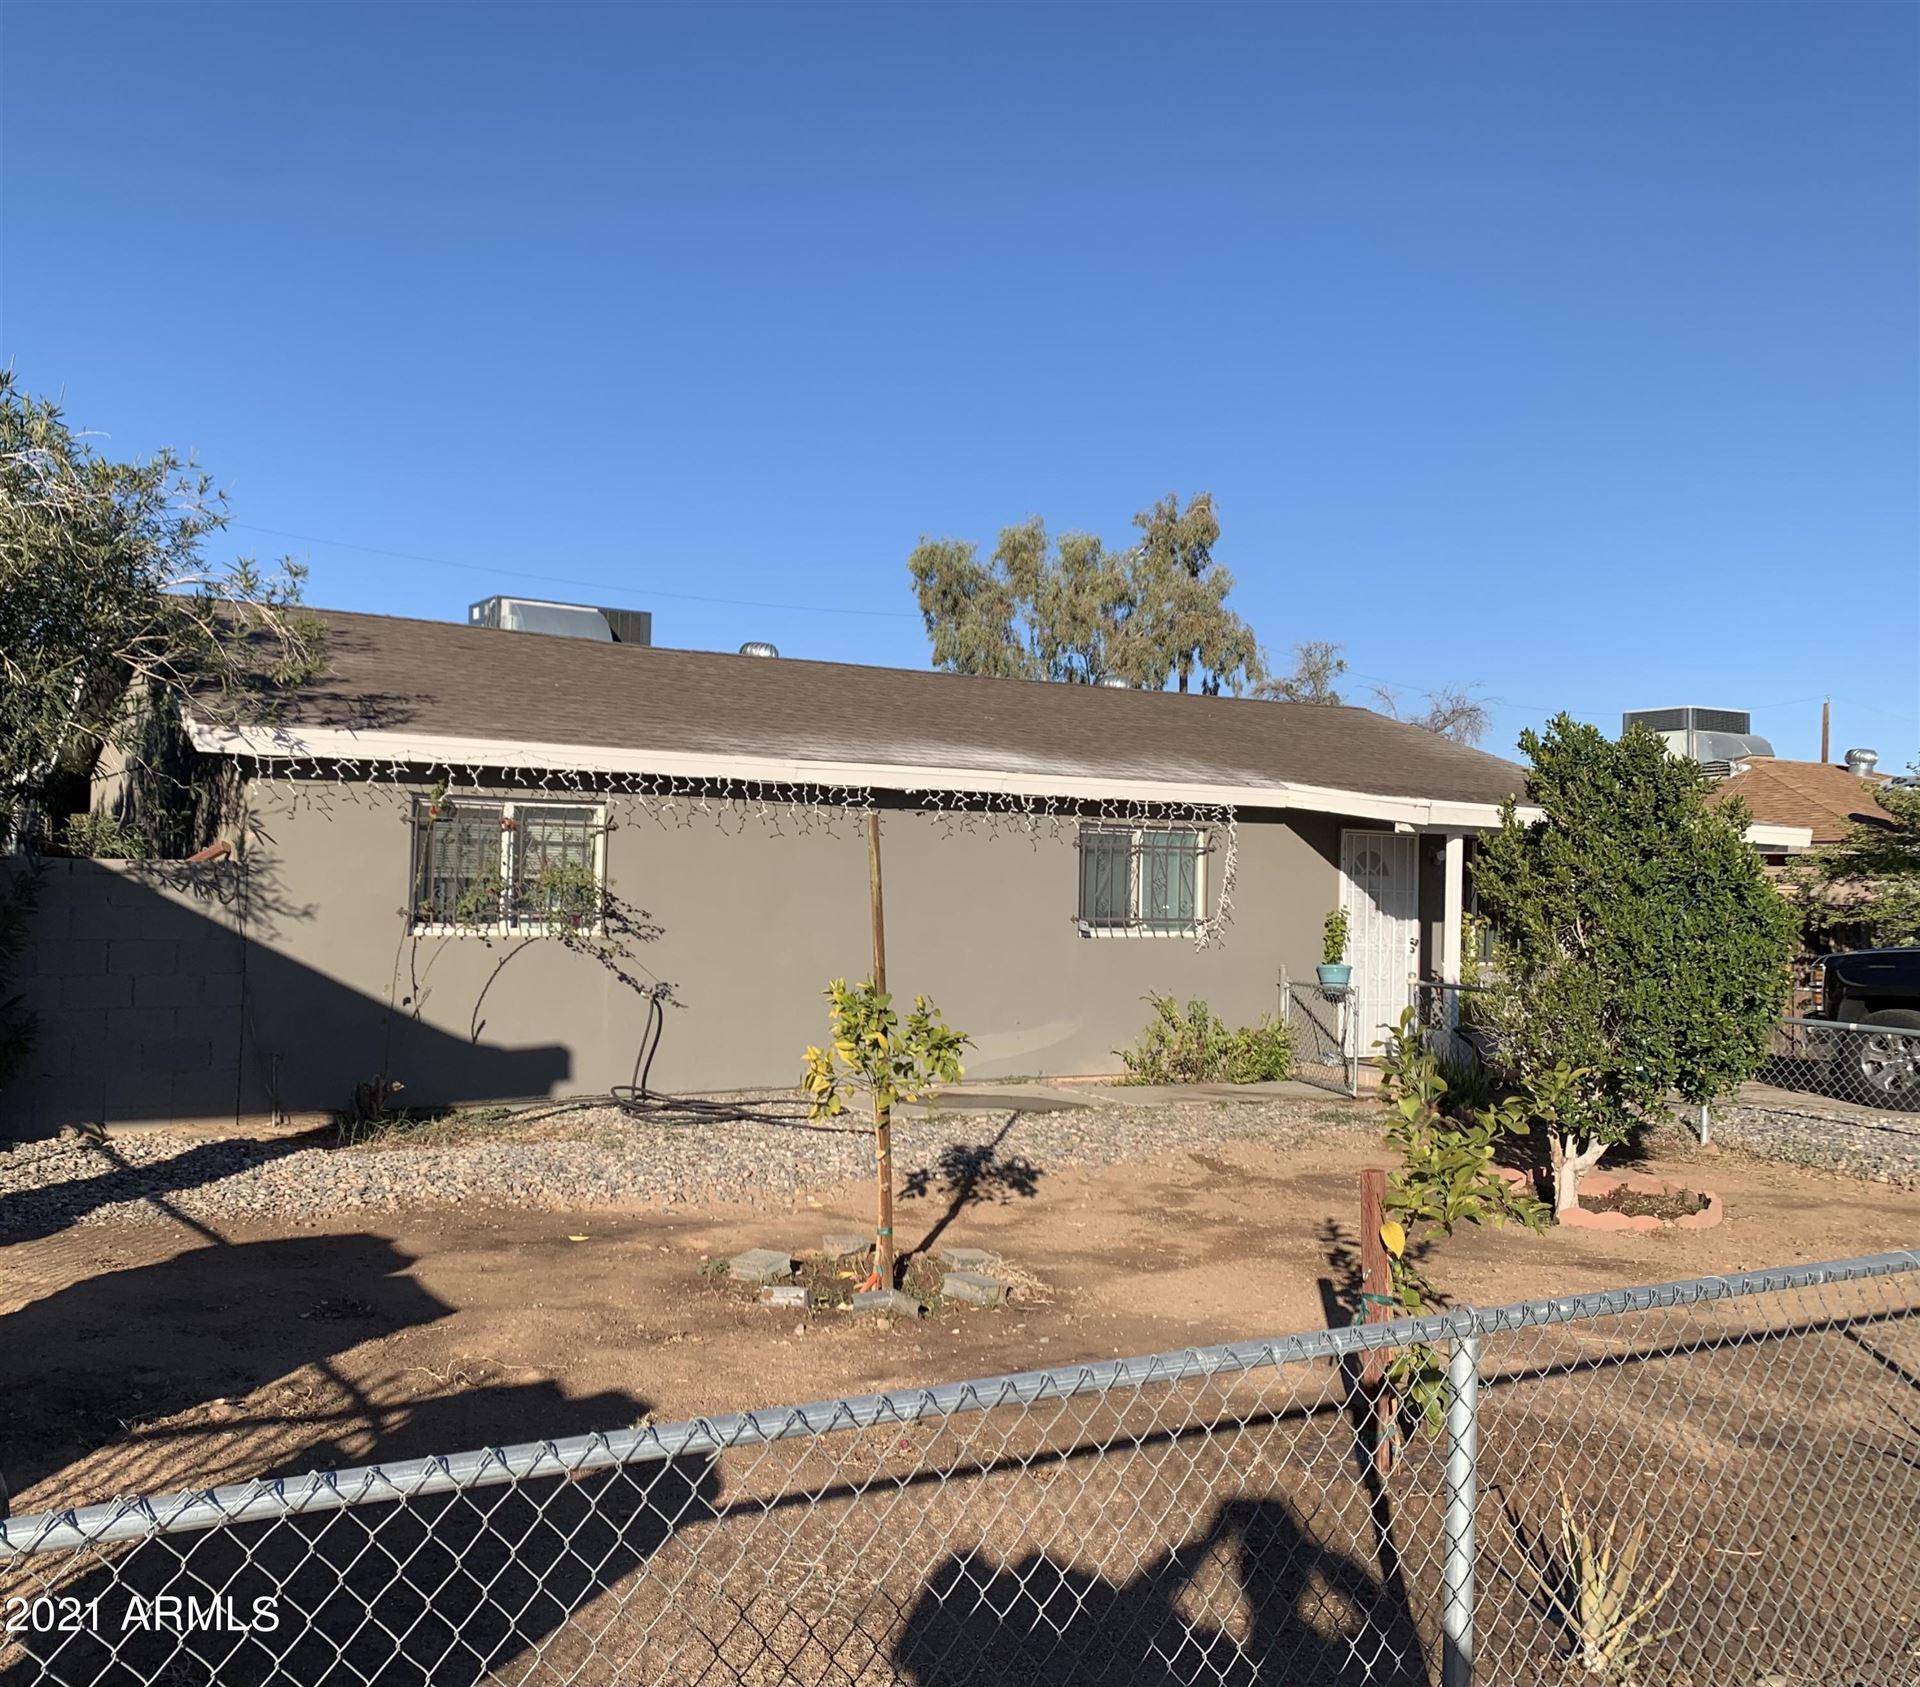 6036 S 13TH Place, Phoenix, AZ 85042 - MLS#: 6177960